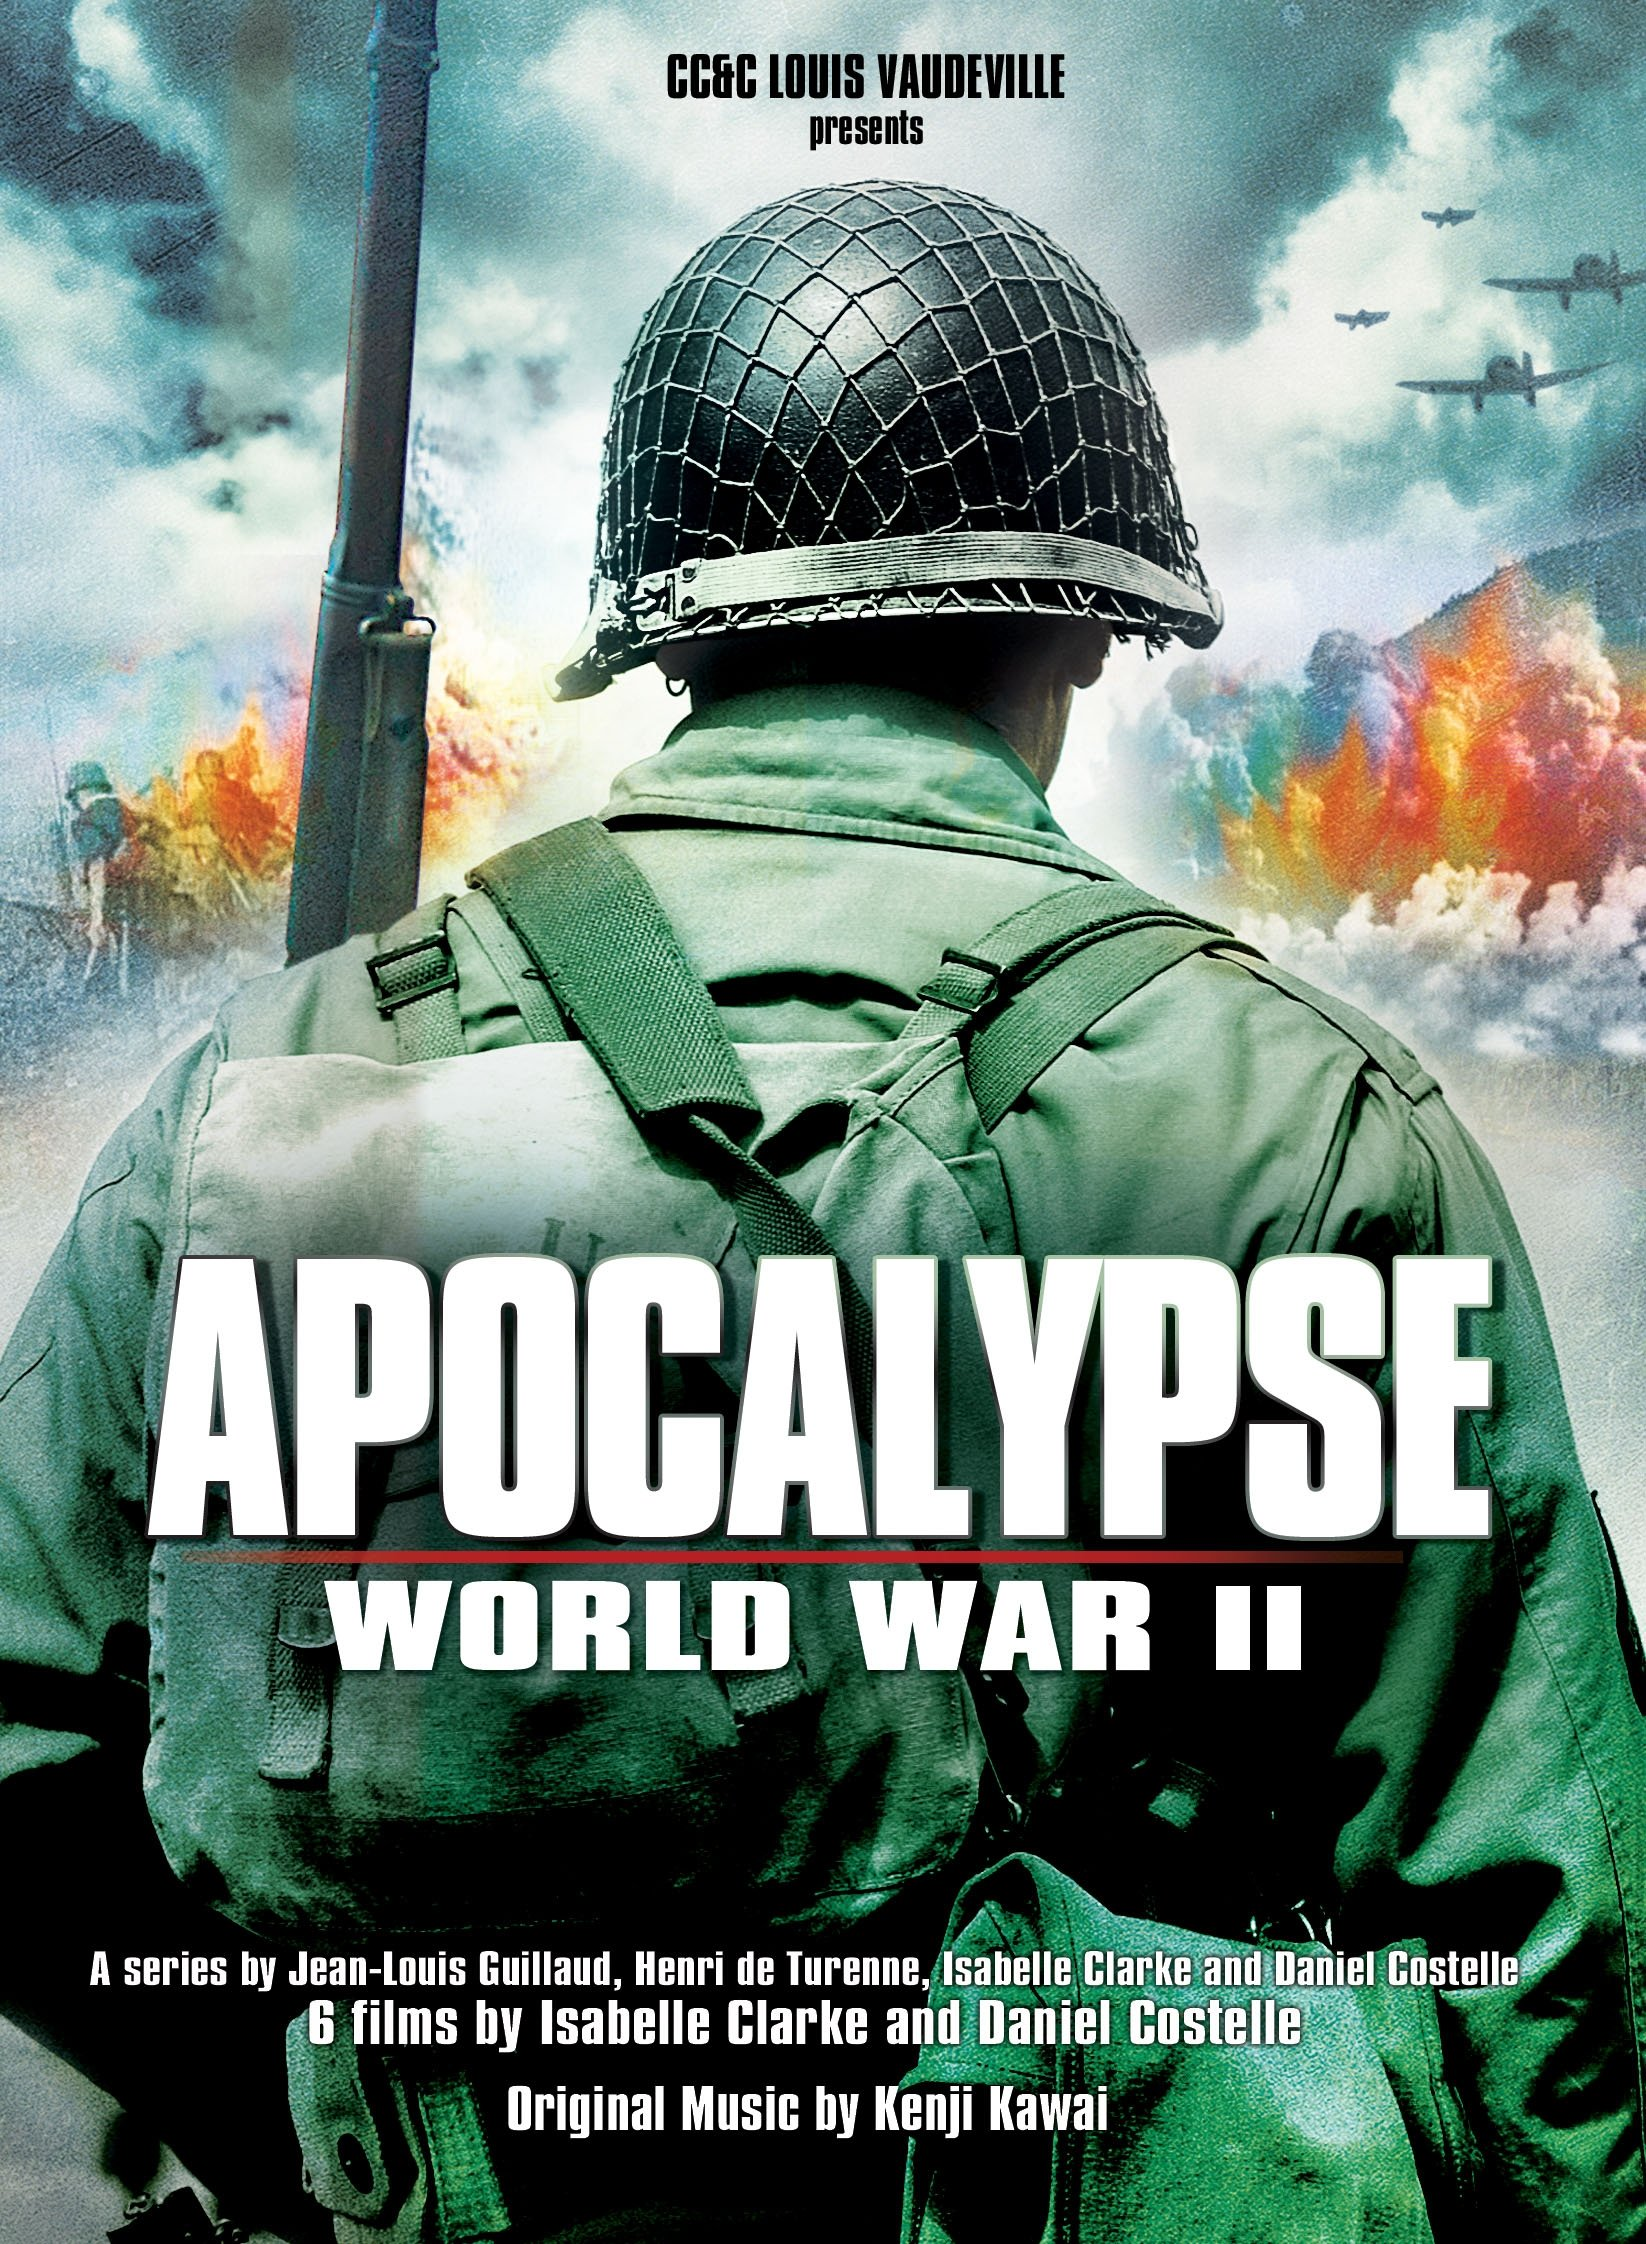 Apocalypse - The Second World War